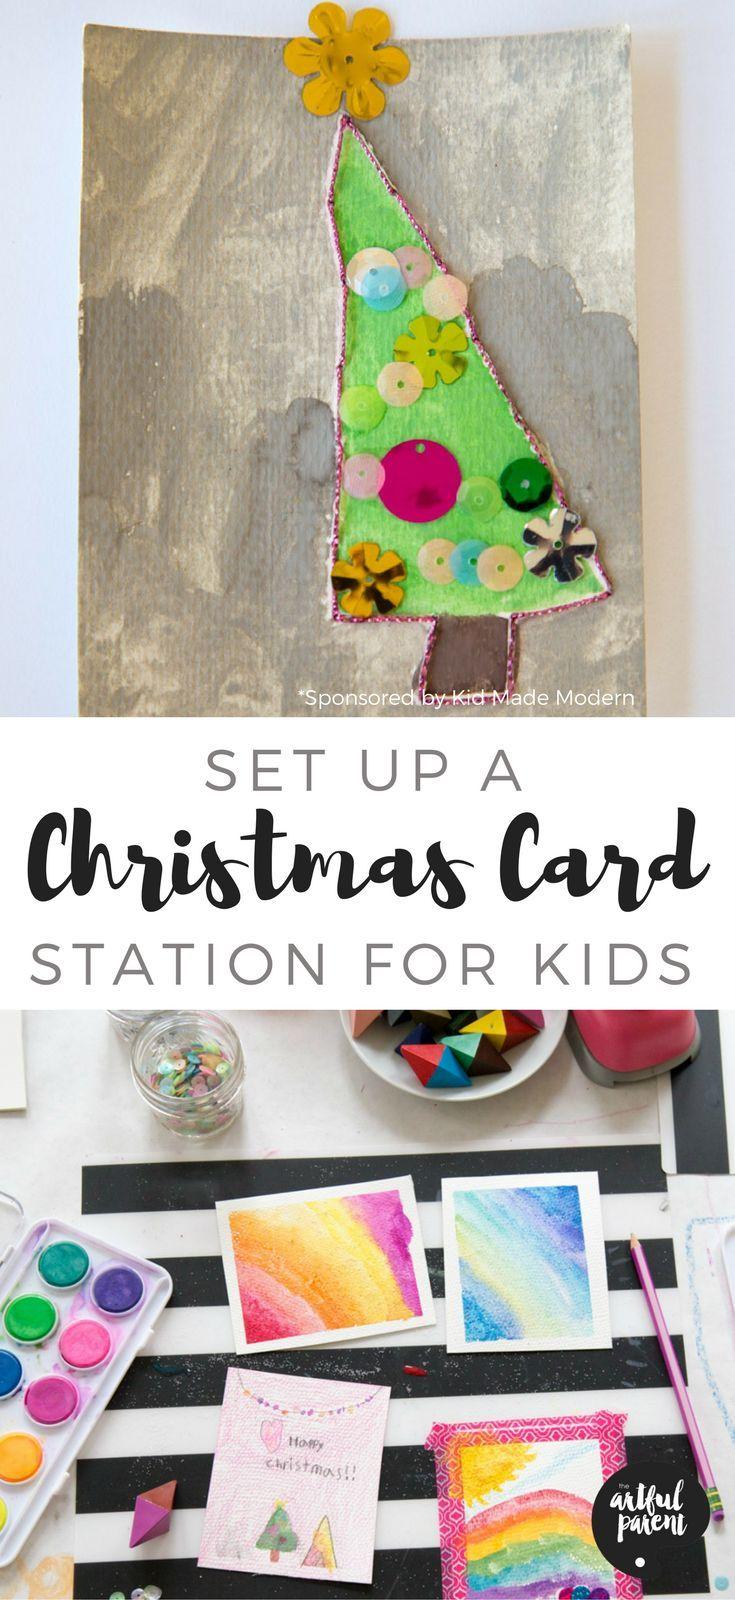 A Homemade Christmas Card Making Station for Kids | Pinterest ...